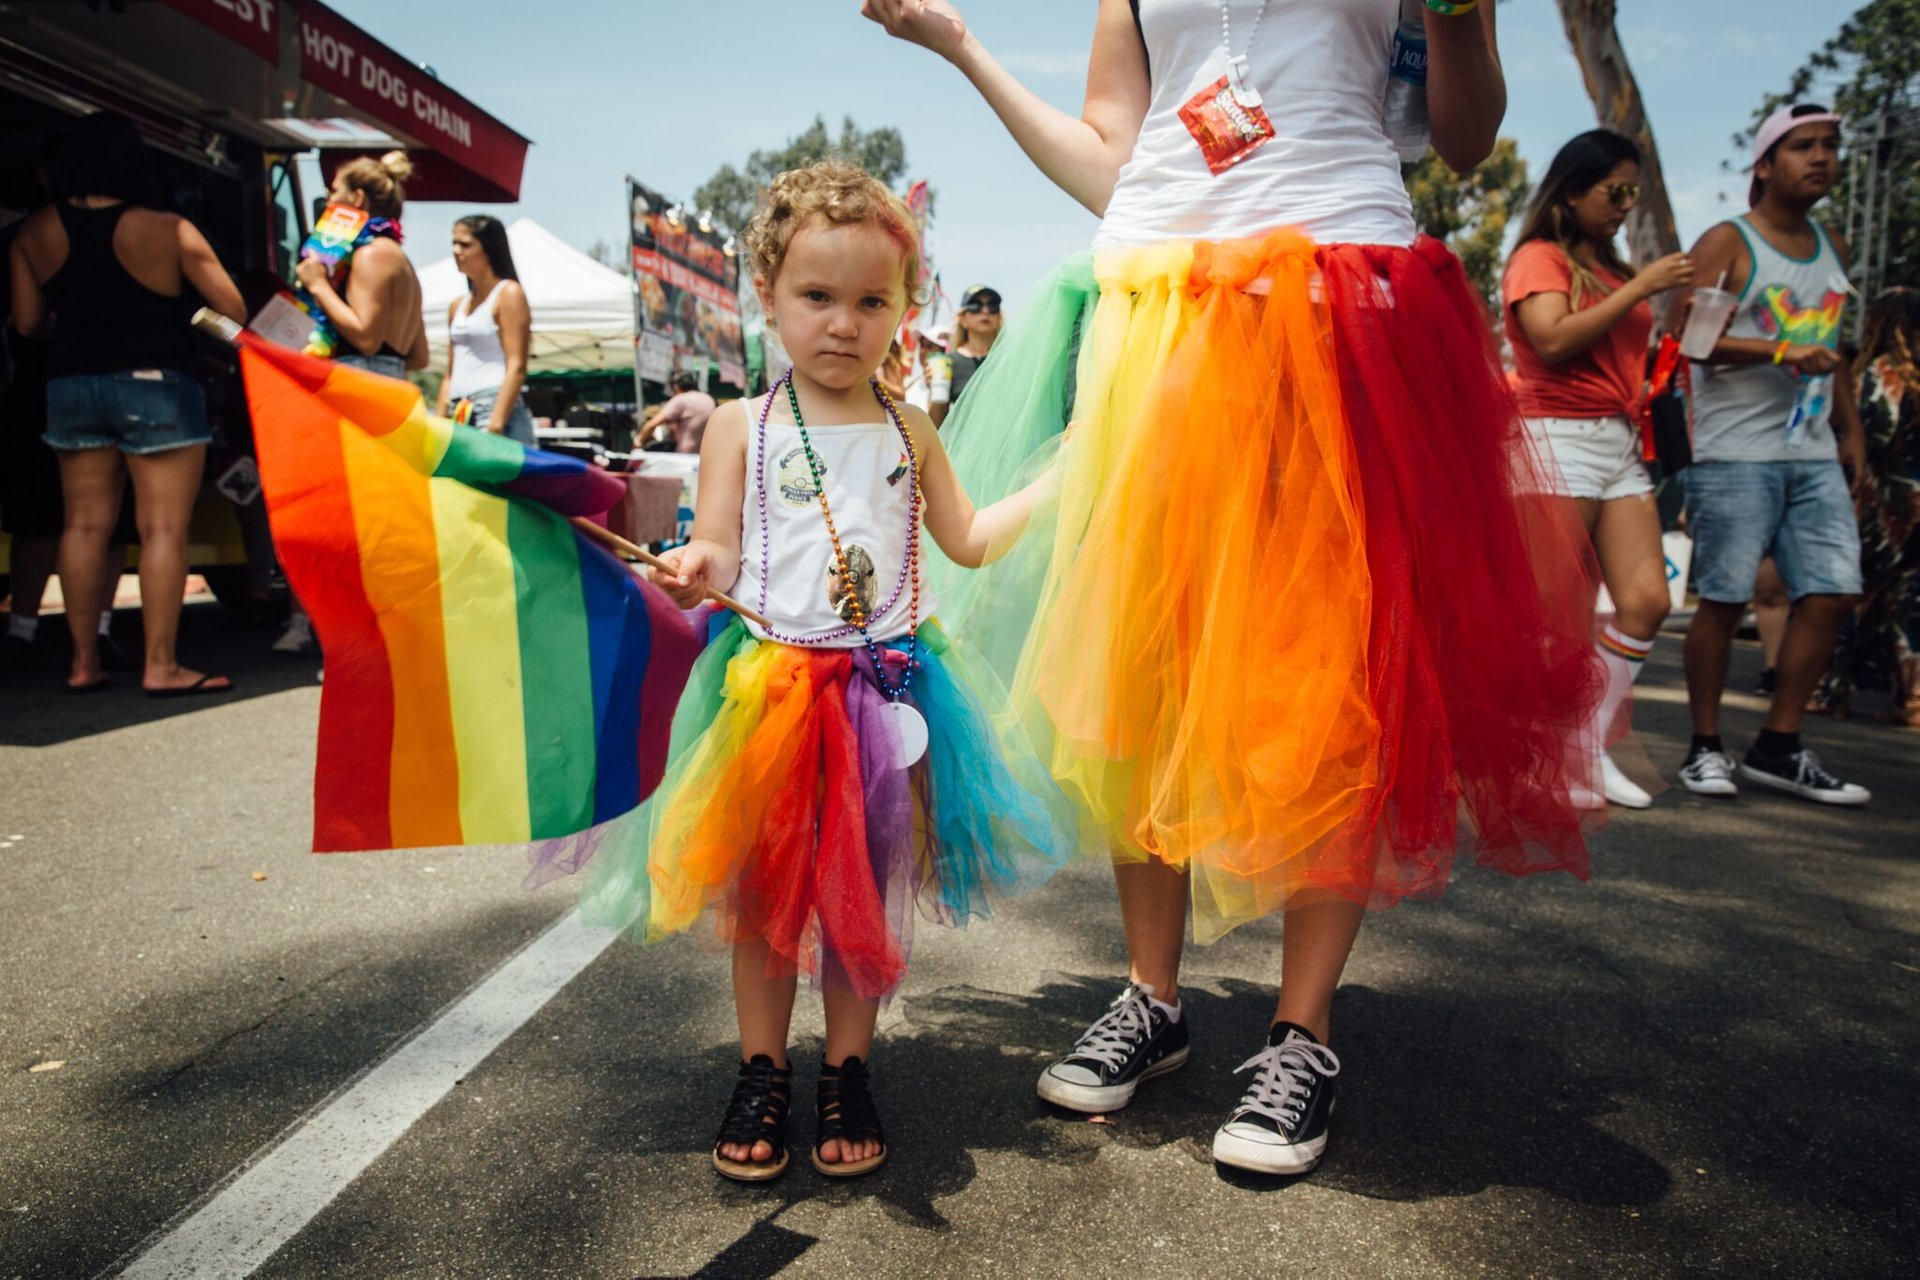 San Diego Pride Parade in San Diego 2020 - Best Time